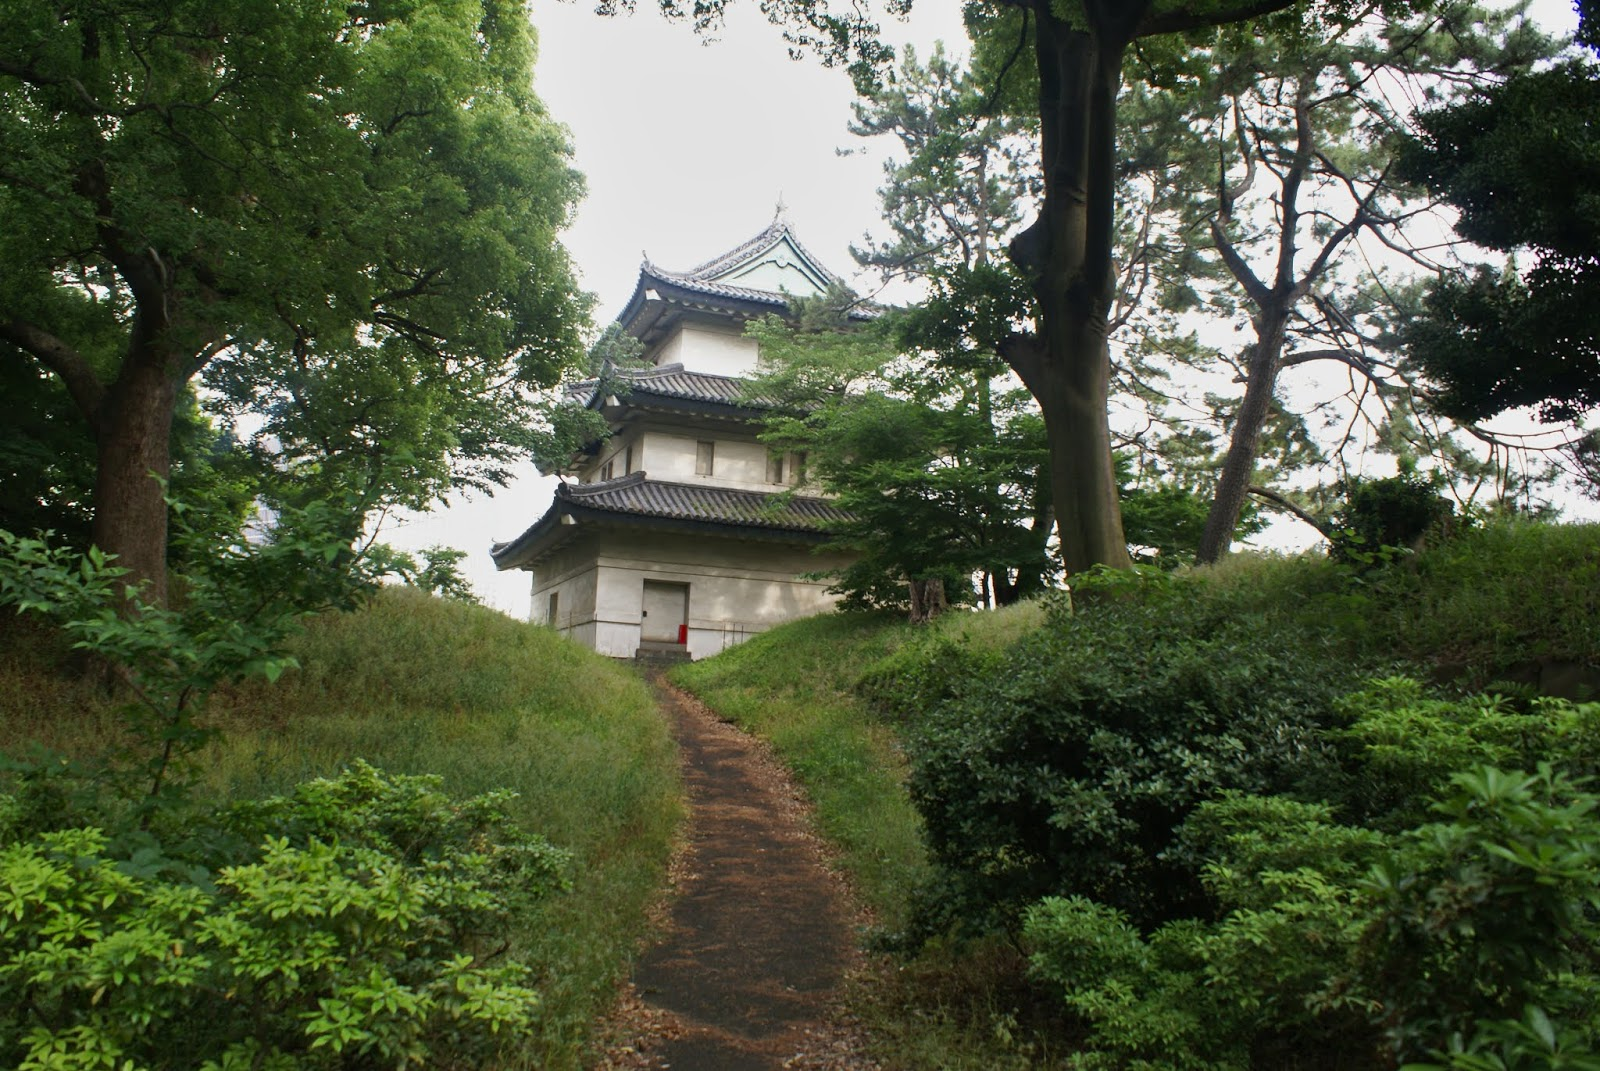 tokyo marunouchi imperial palace Kōkyo fujimi-yagura keep